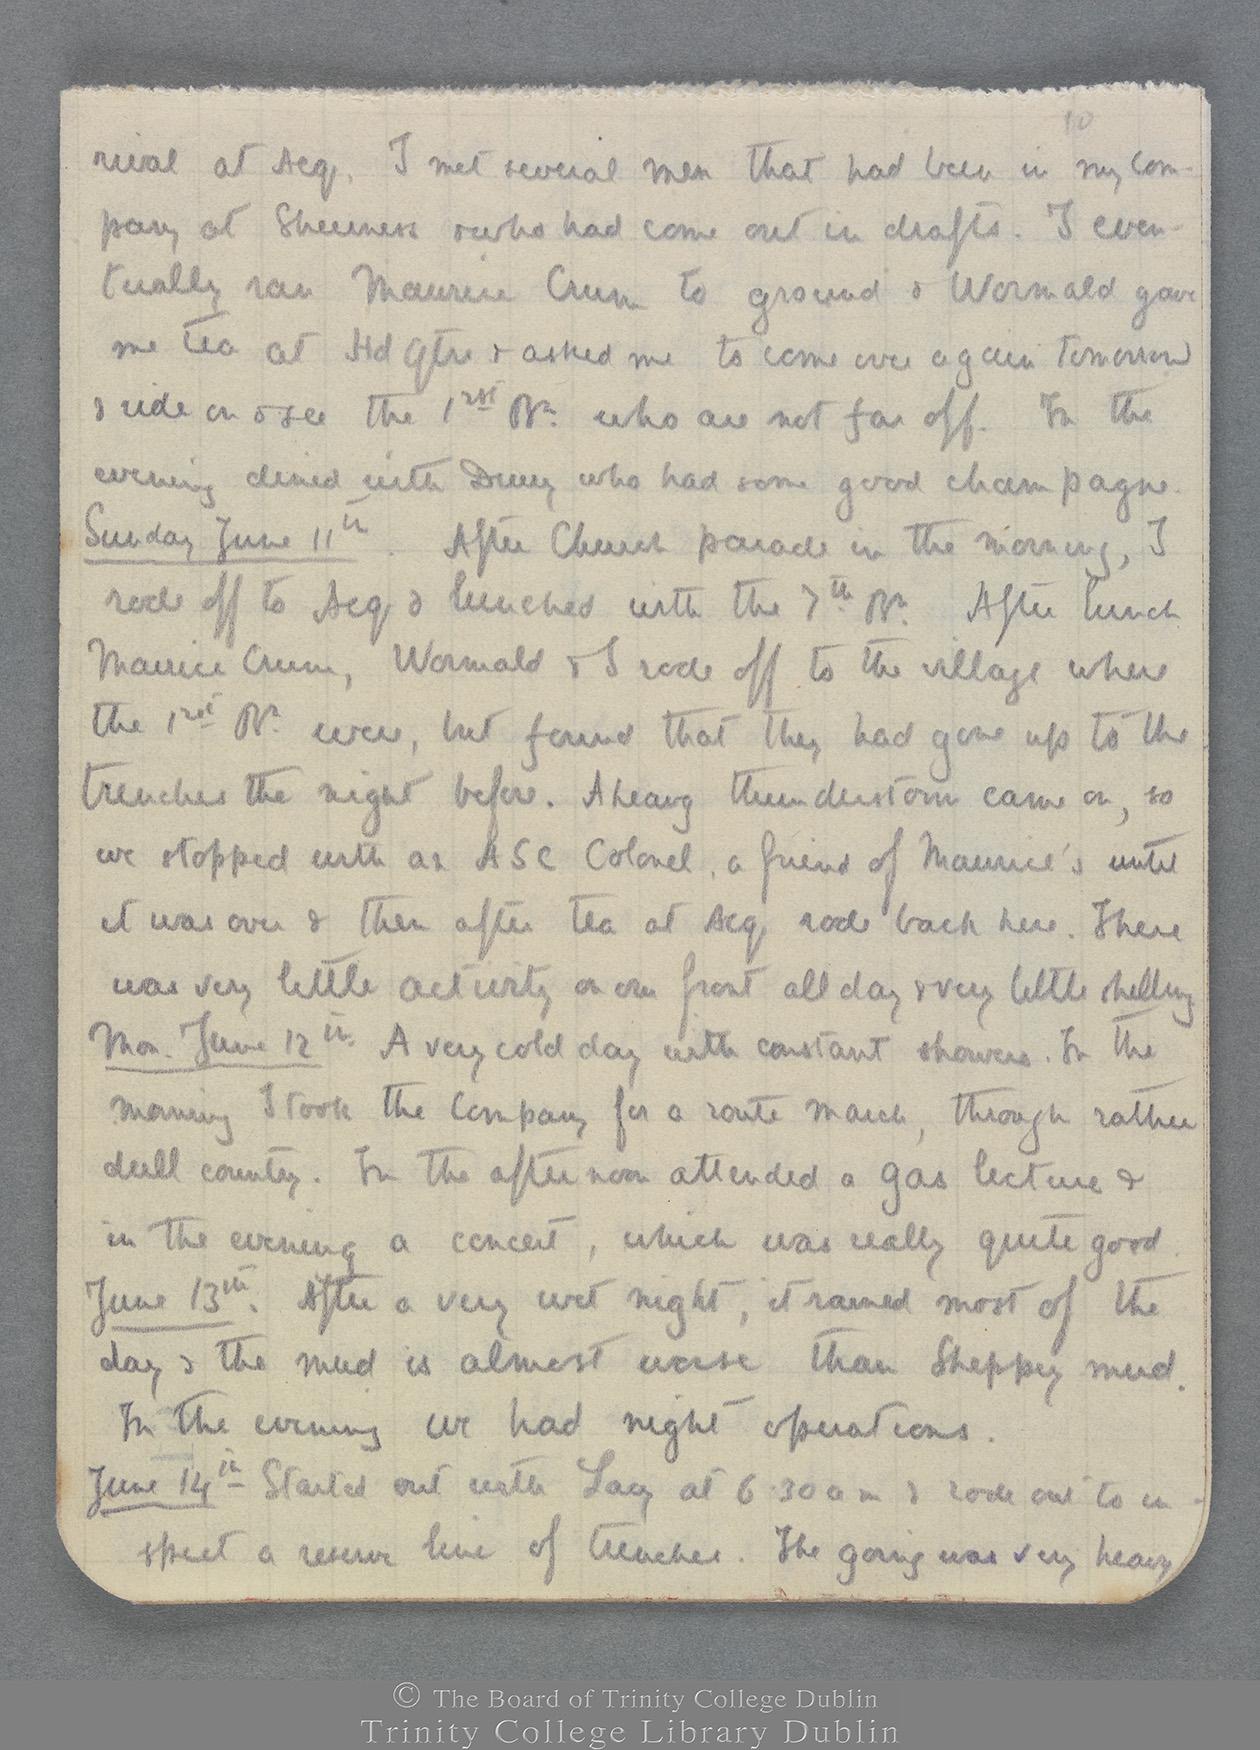 TCD MS 10821 folio 10 recto